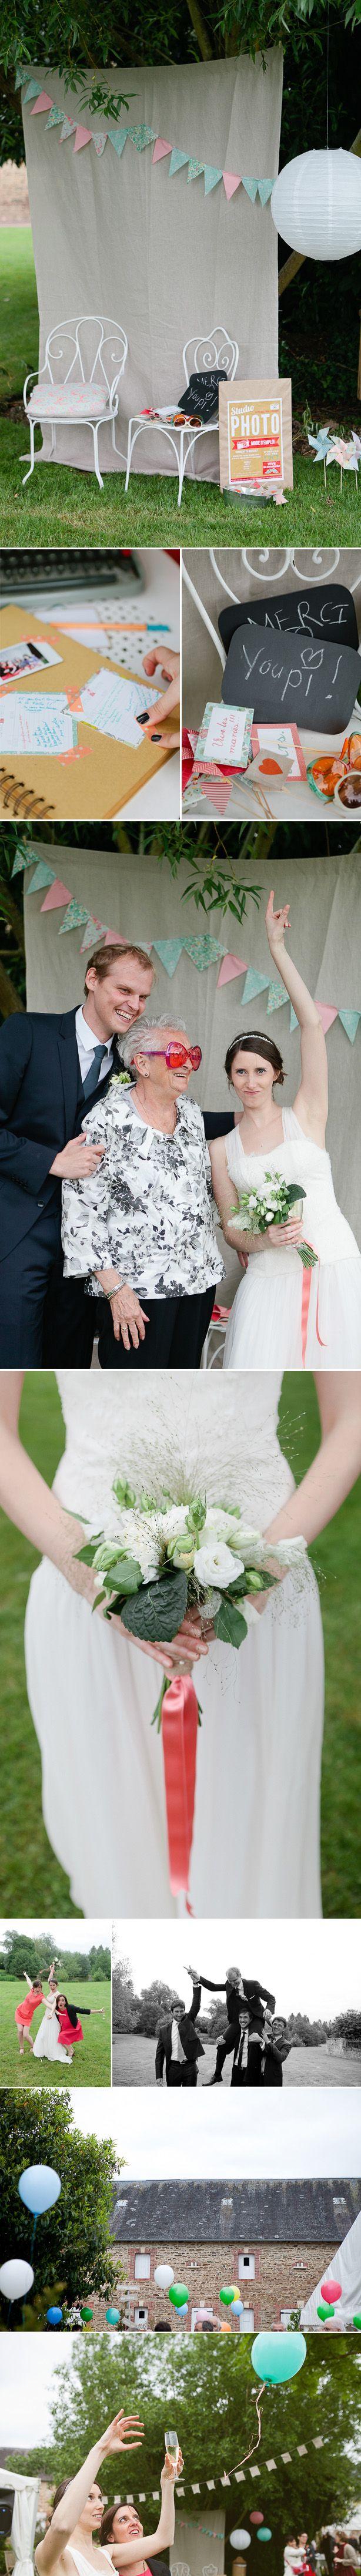 le-blog-de-madame-c-mariage-normandie-manoir-de-la-queue-du-renard-sophie-delaveau-photographe-5